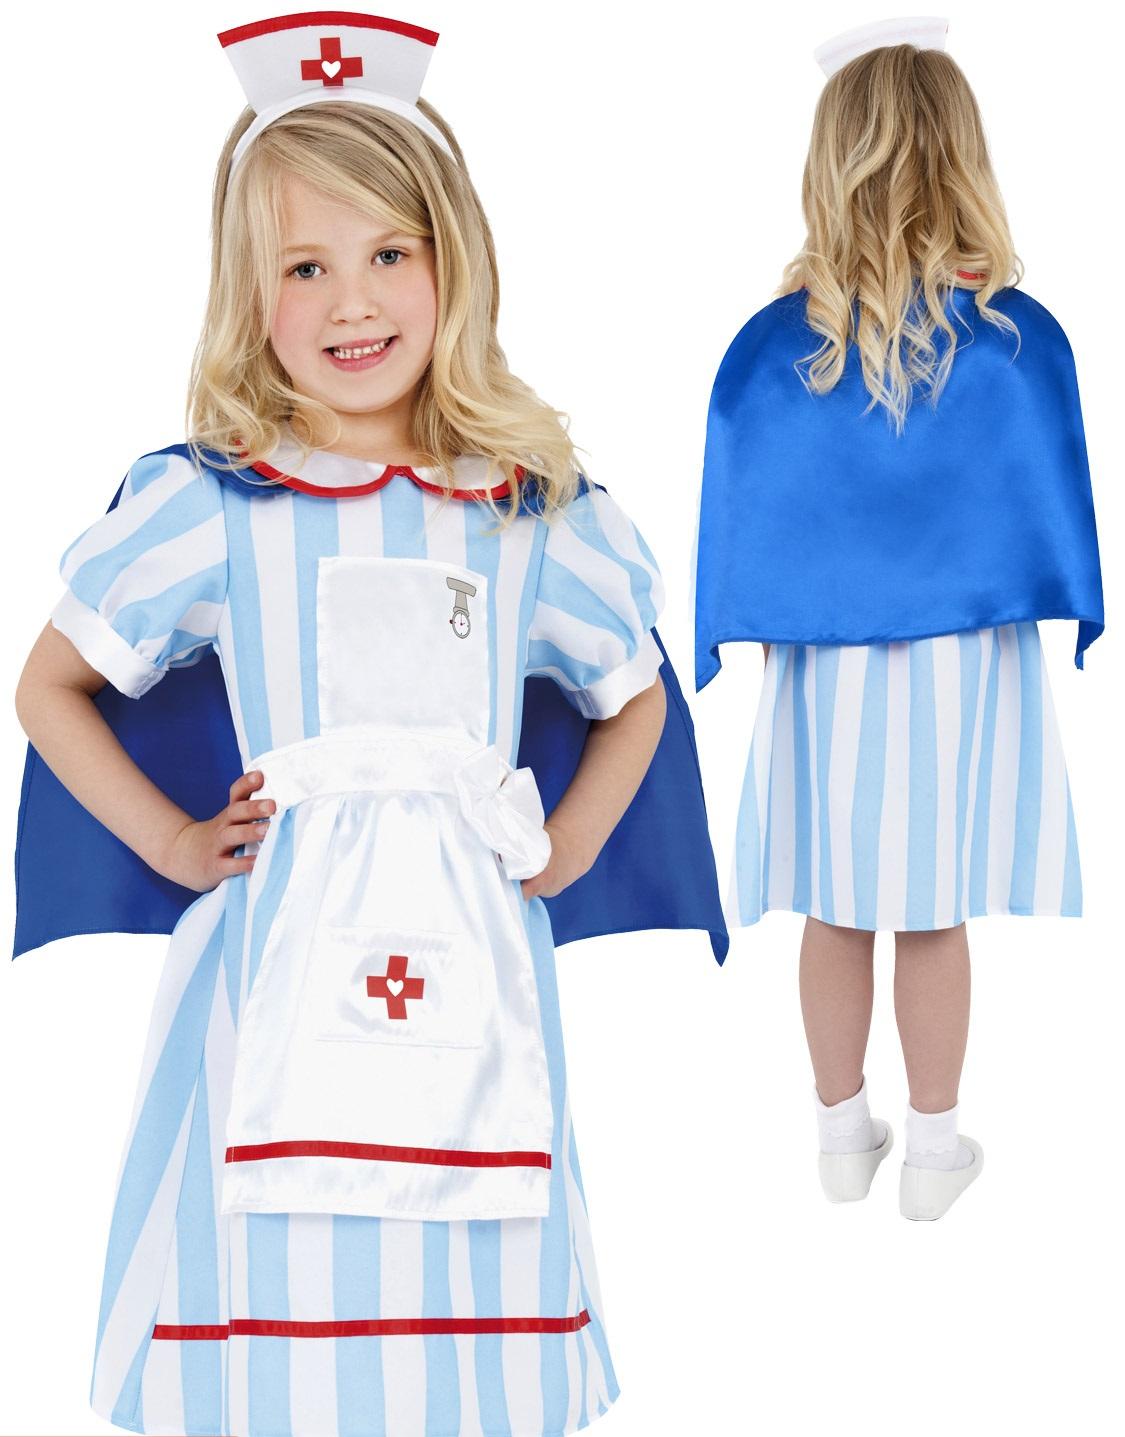 660e6bbdc49 Details about Girls Vintage Nurse Costume Childs Hospital Fancy Dress Kids  Book Week New